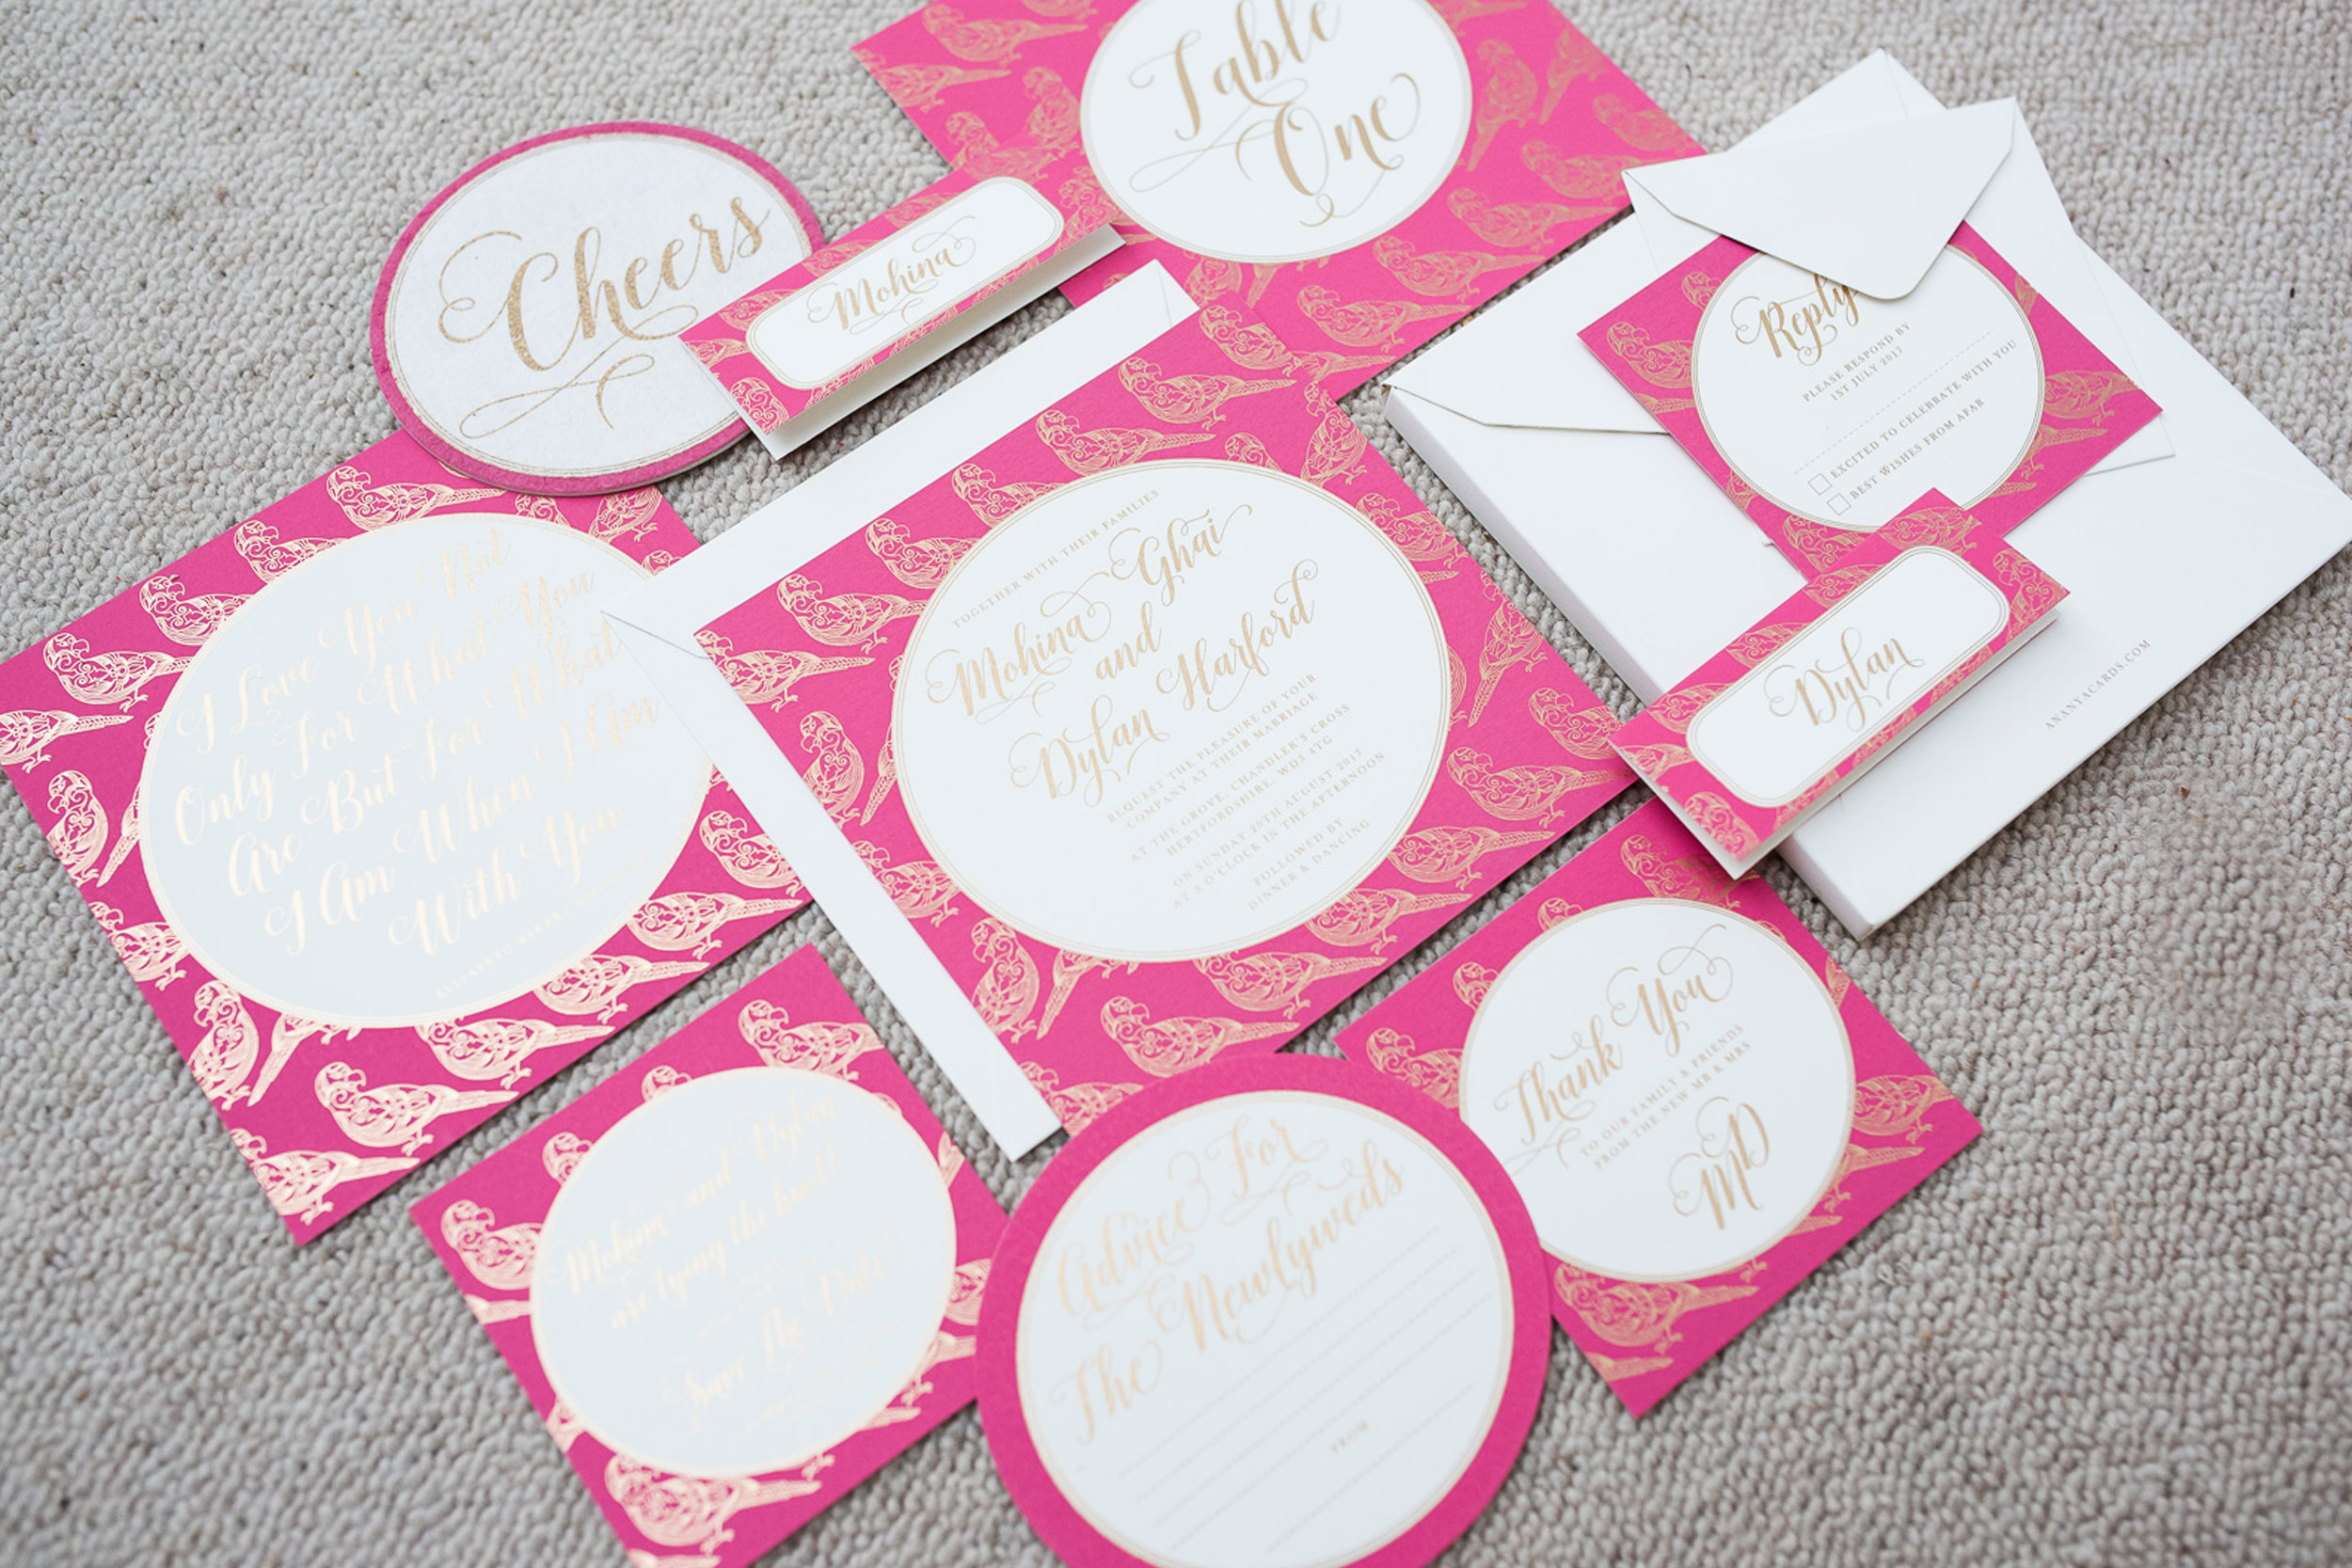 trio-of-life-pink-parrot-wedding-invitation.jpg